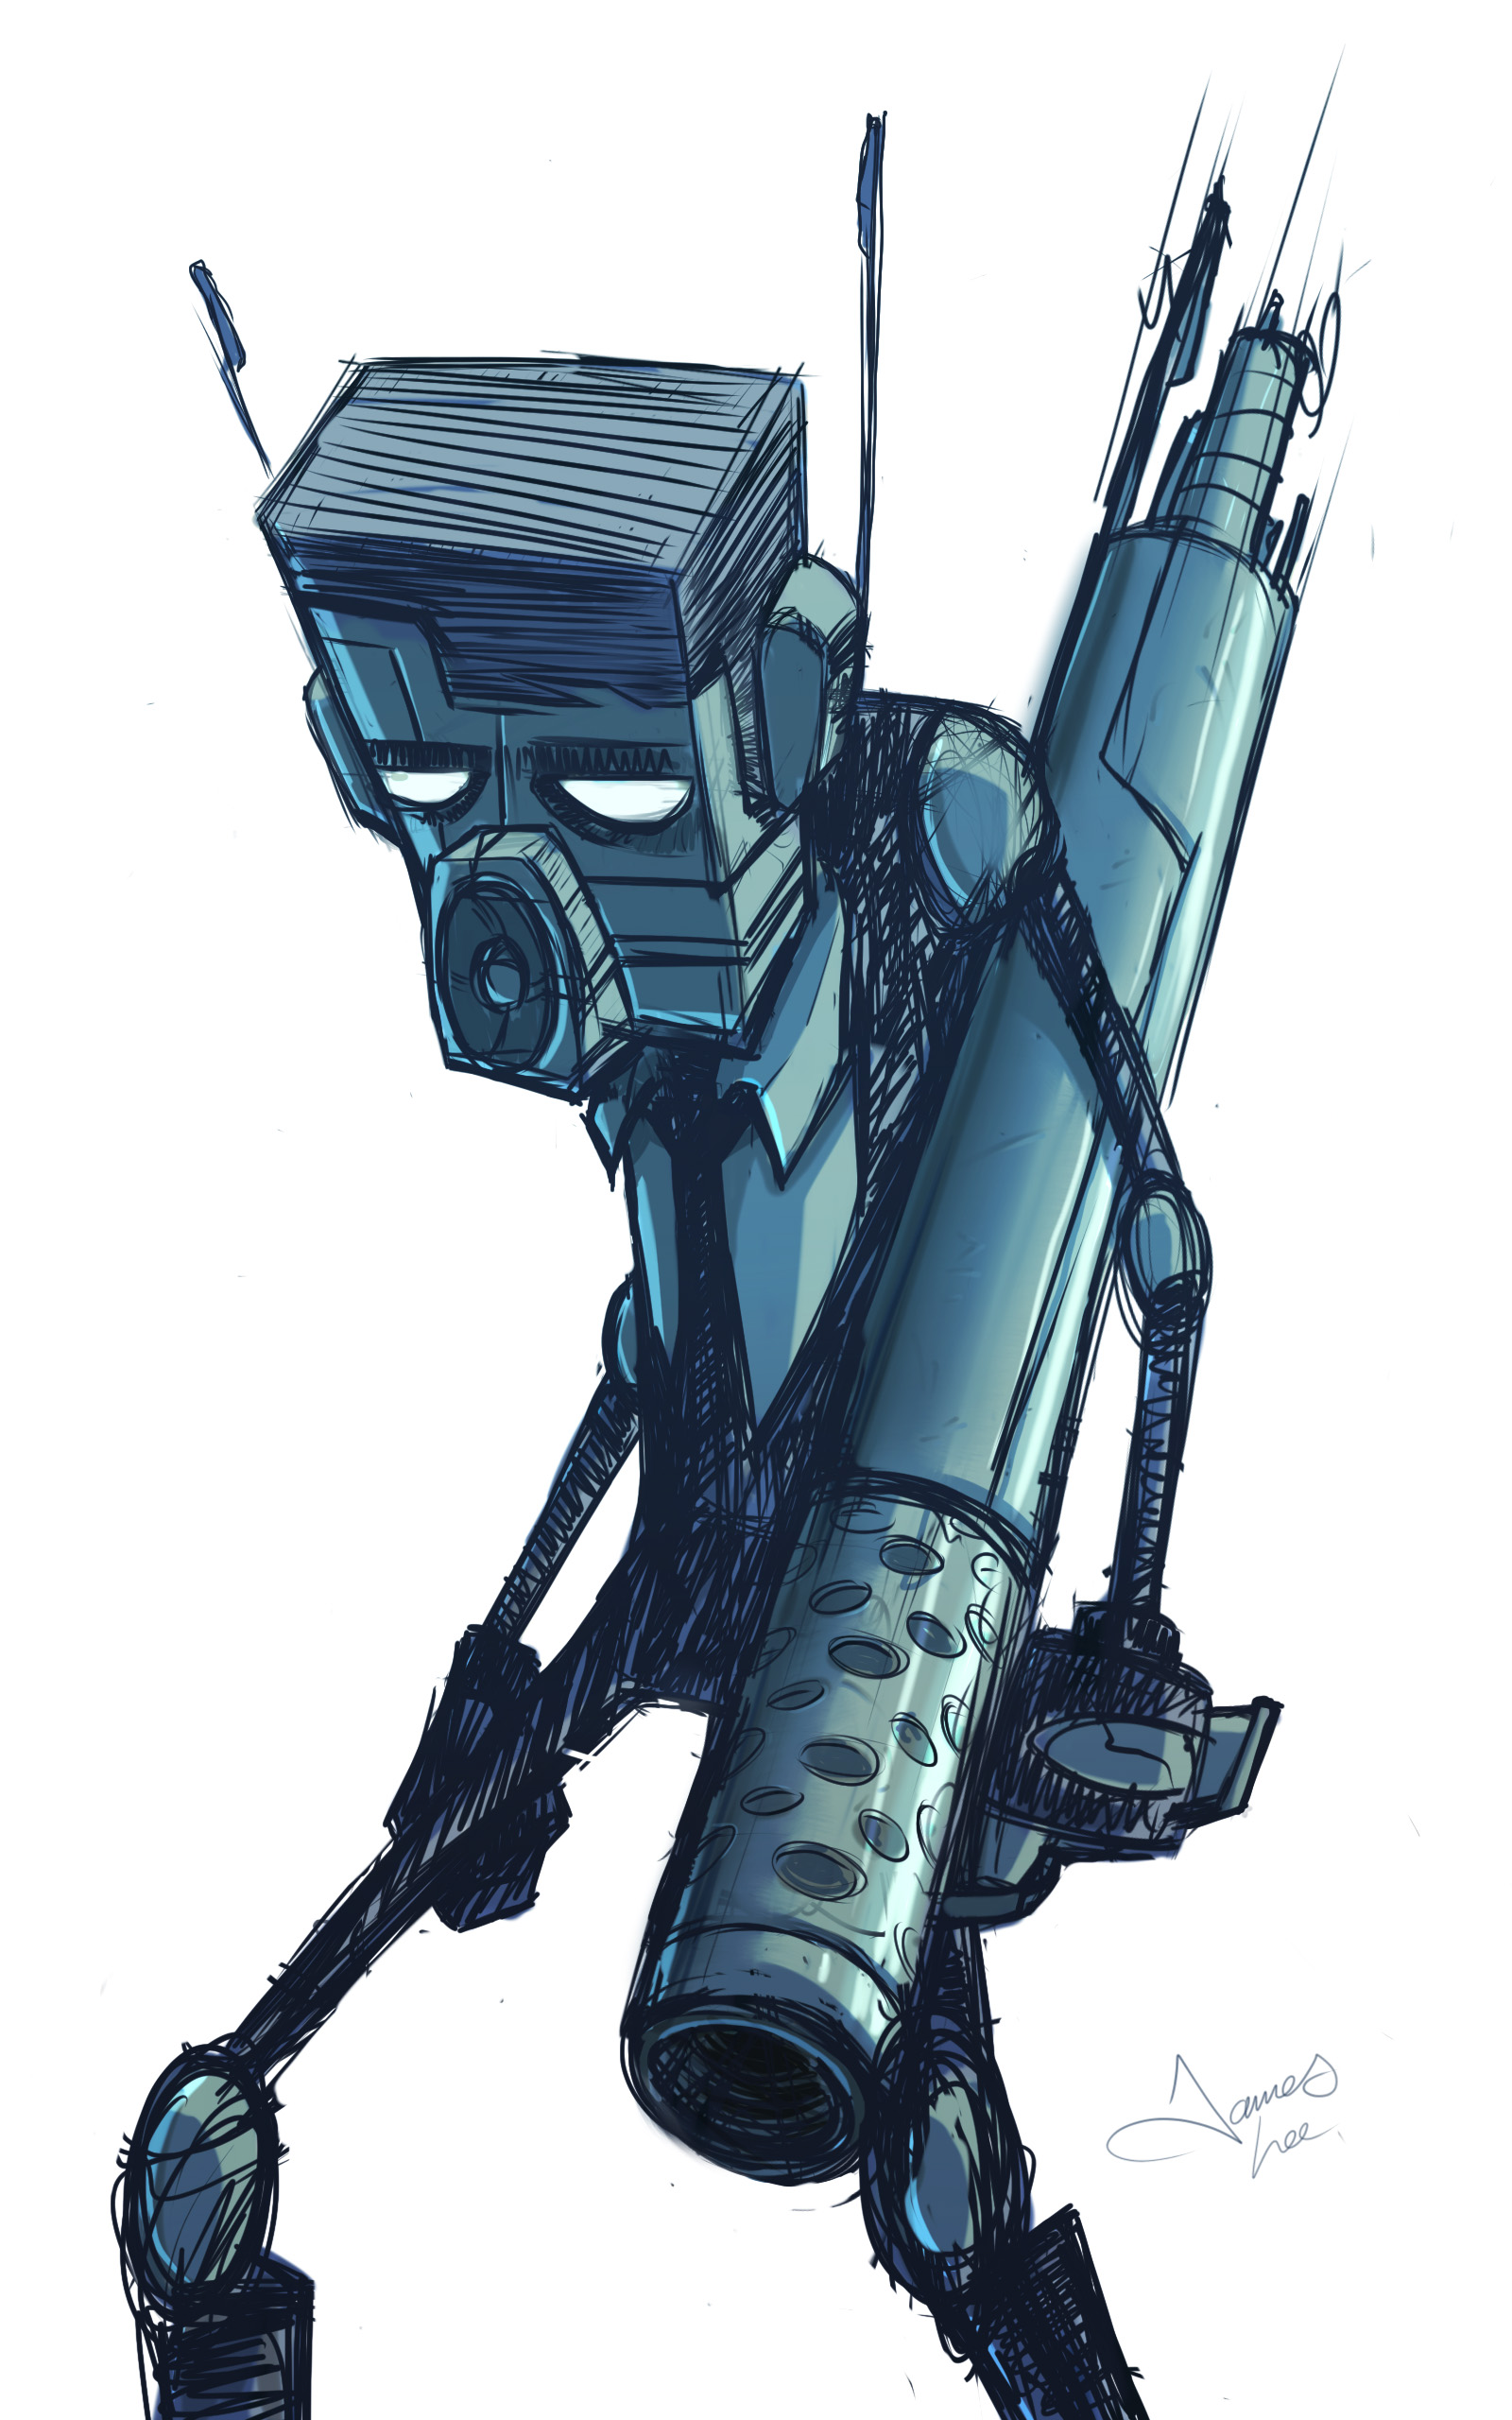 Johnnybot